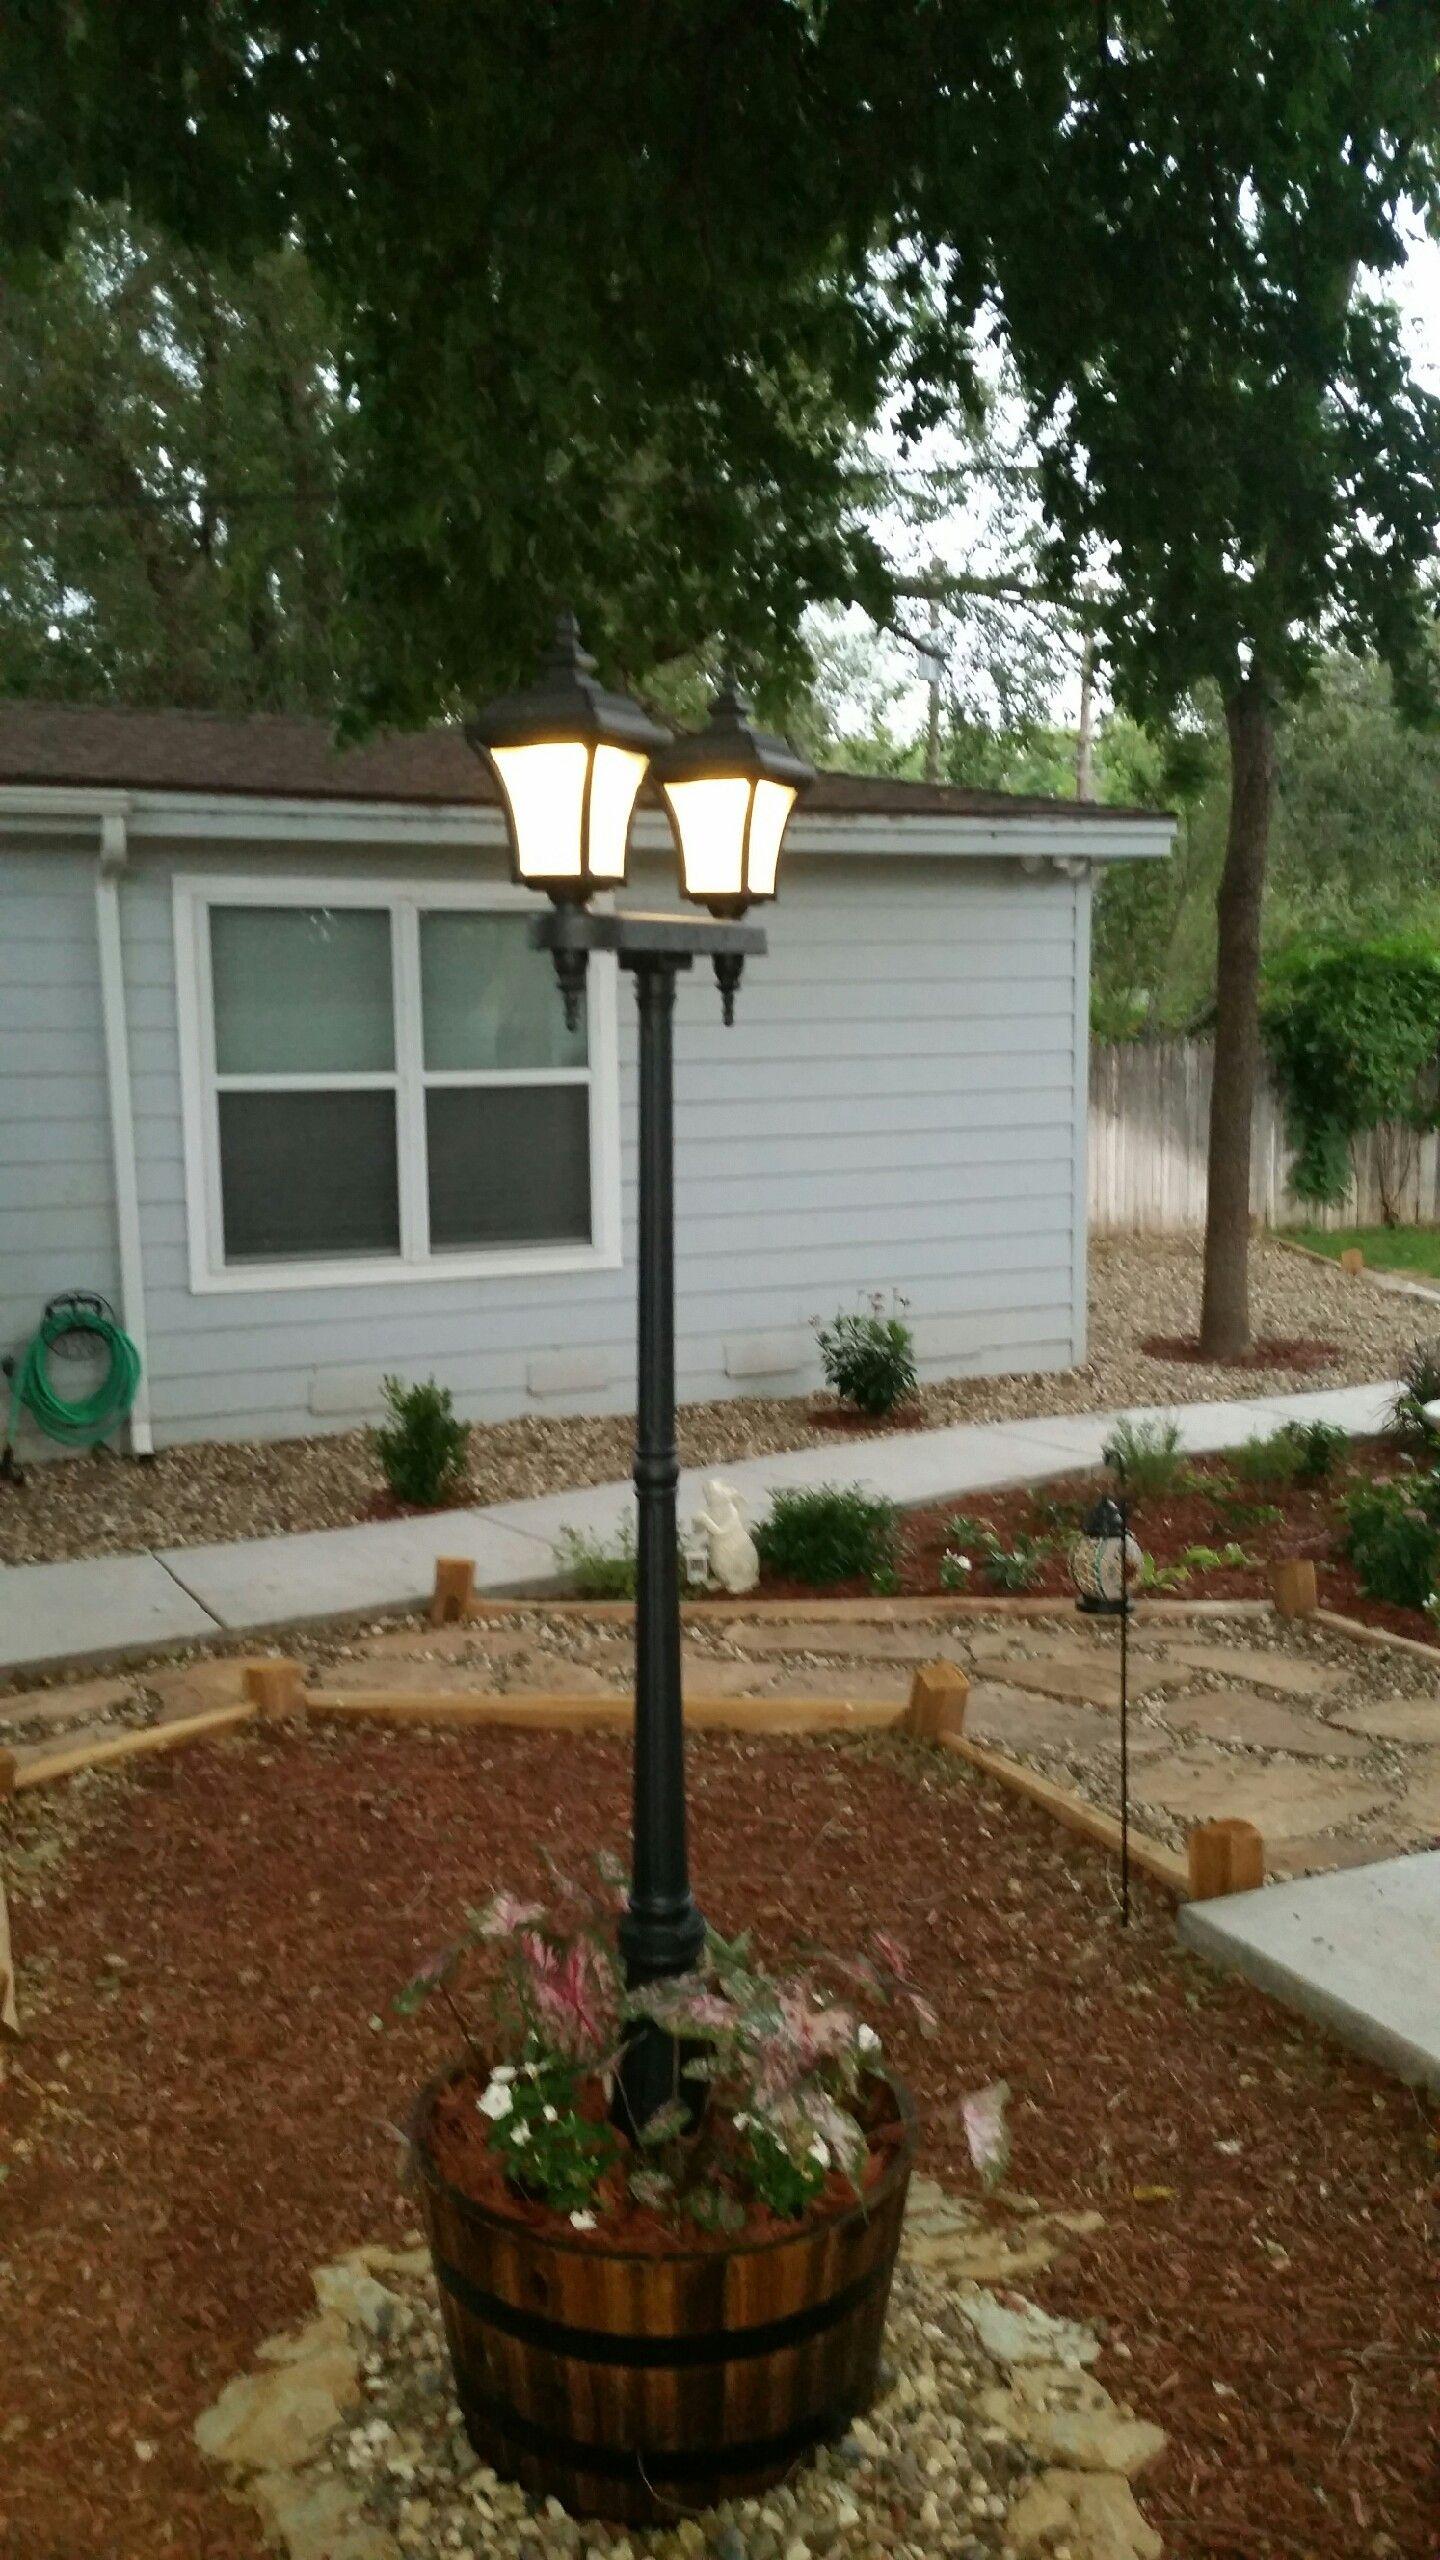 Diy Solar Lamp Post In Whiskey Barrel Diy Outdoor Lighting Cheap Landscaping Ideas Solar Garden Lanterns